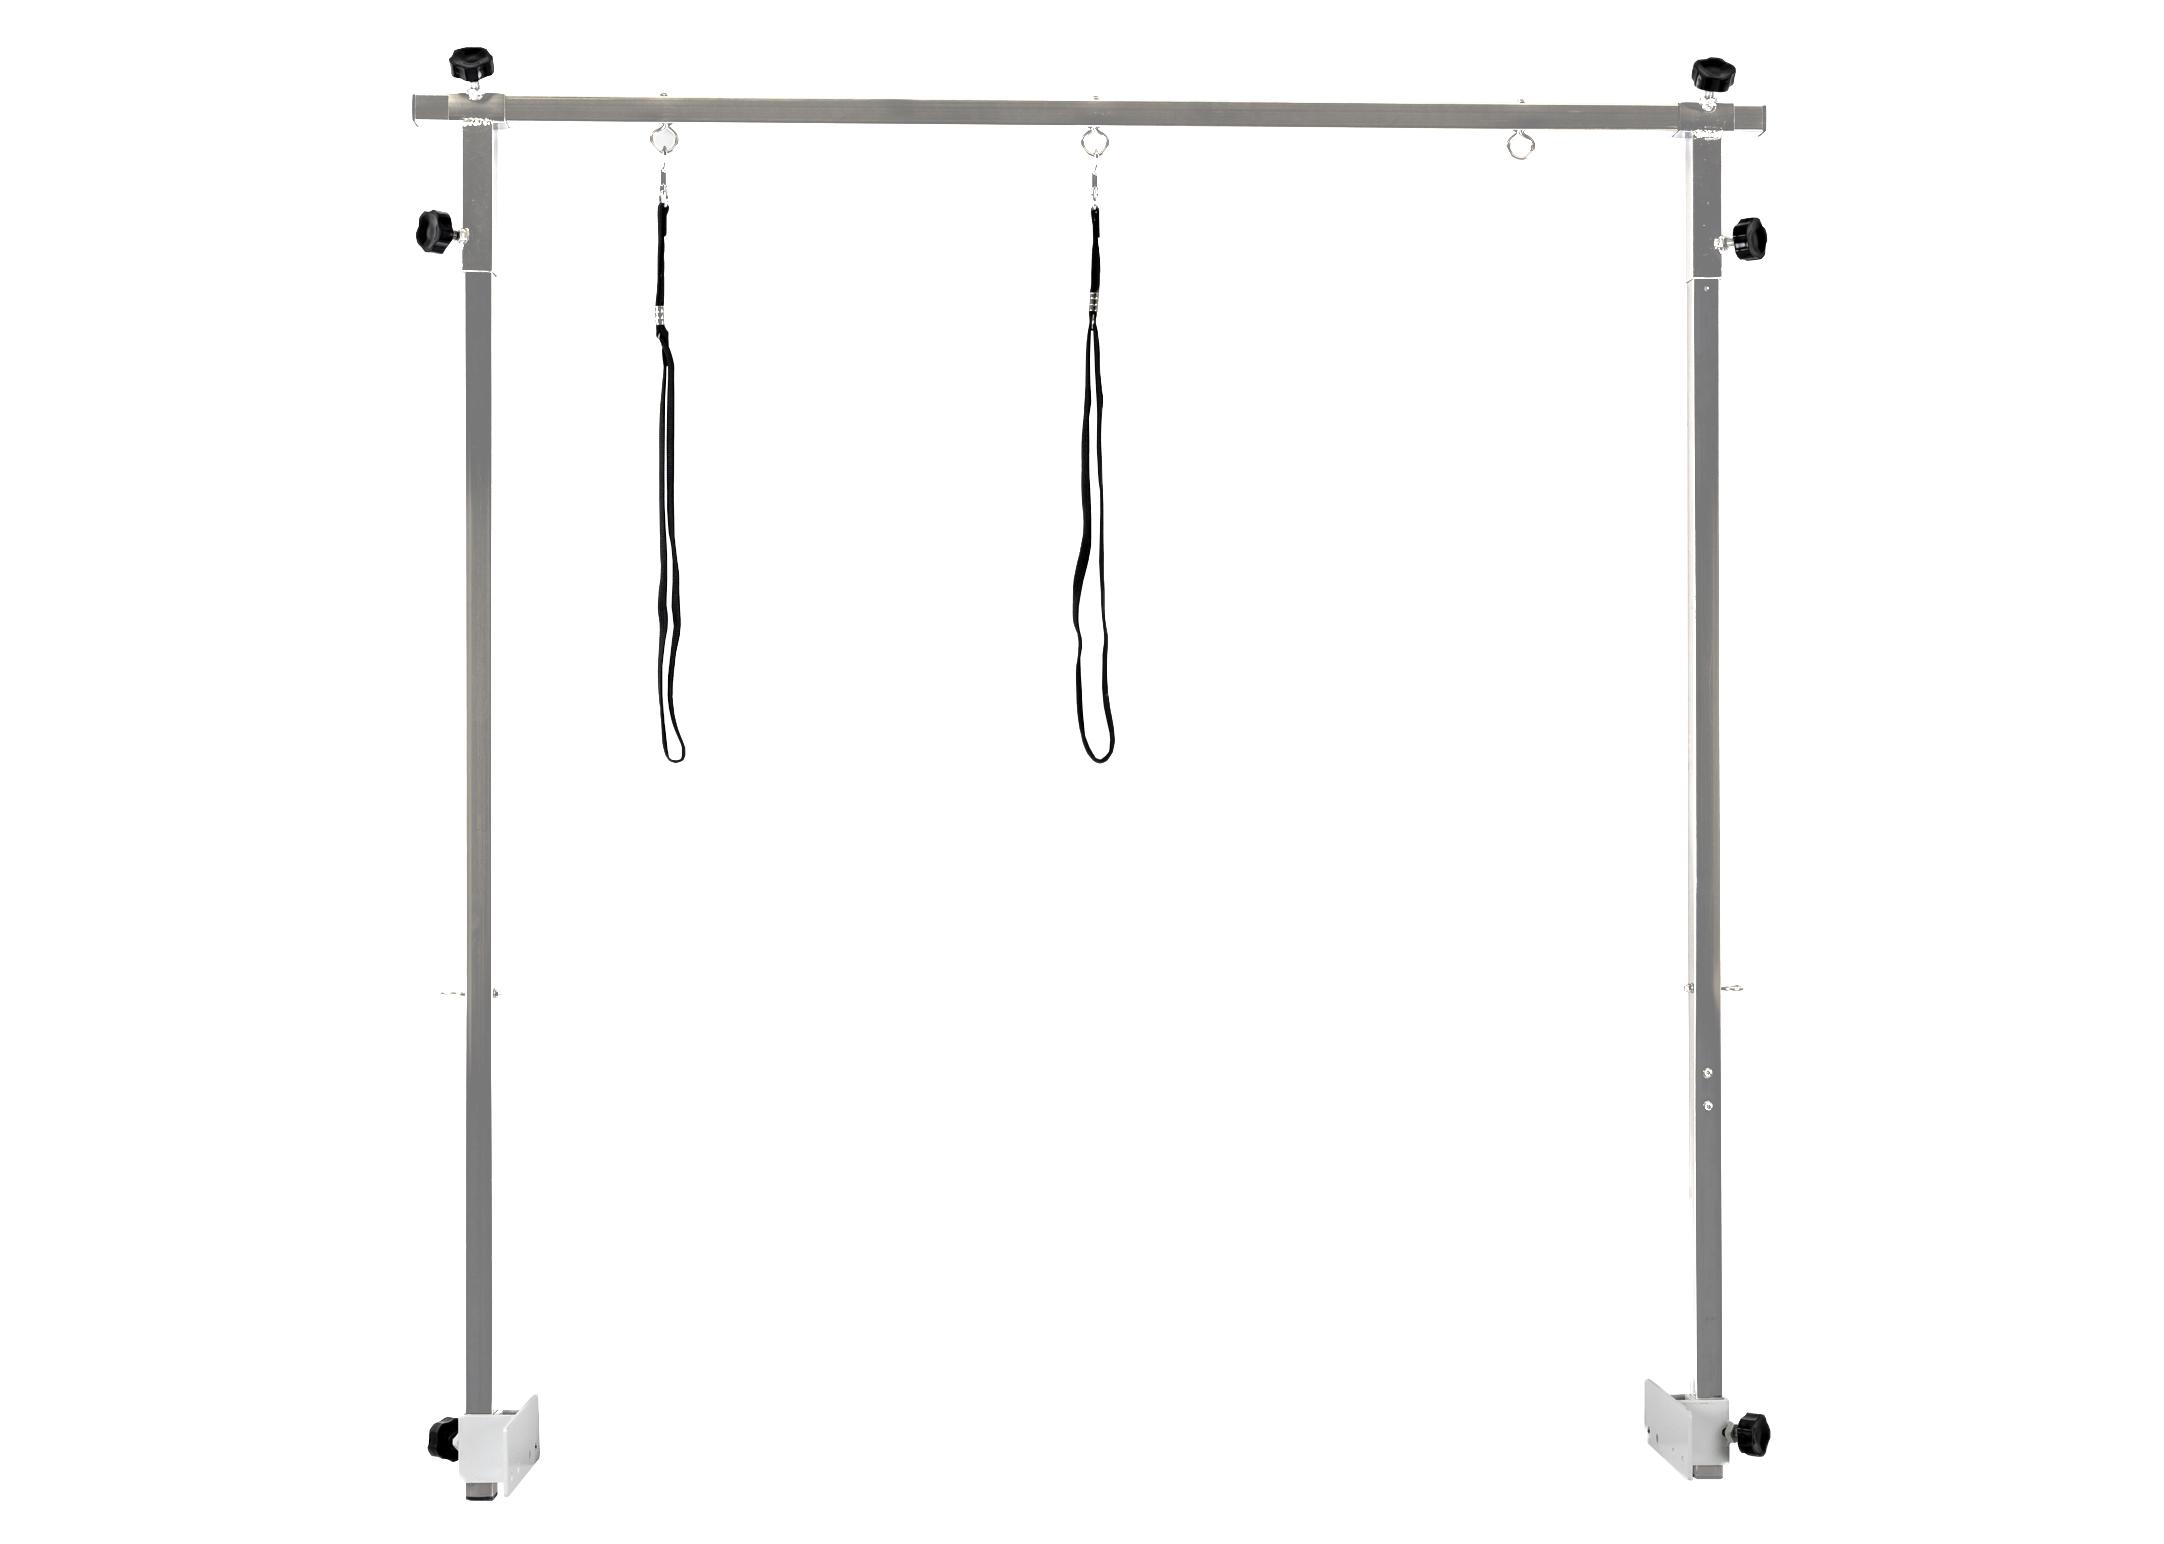 Groom-X Aanpasbare Dubbele Tafelbeugel voor Groom-X Hydraulic/electric Table